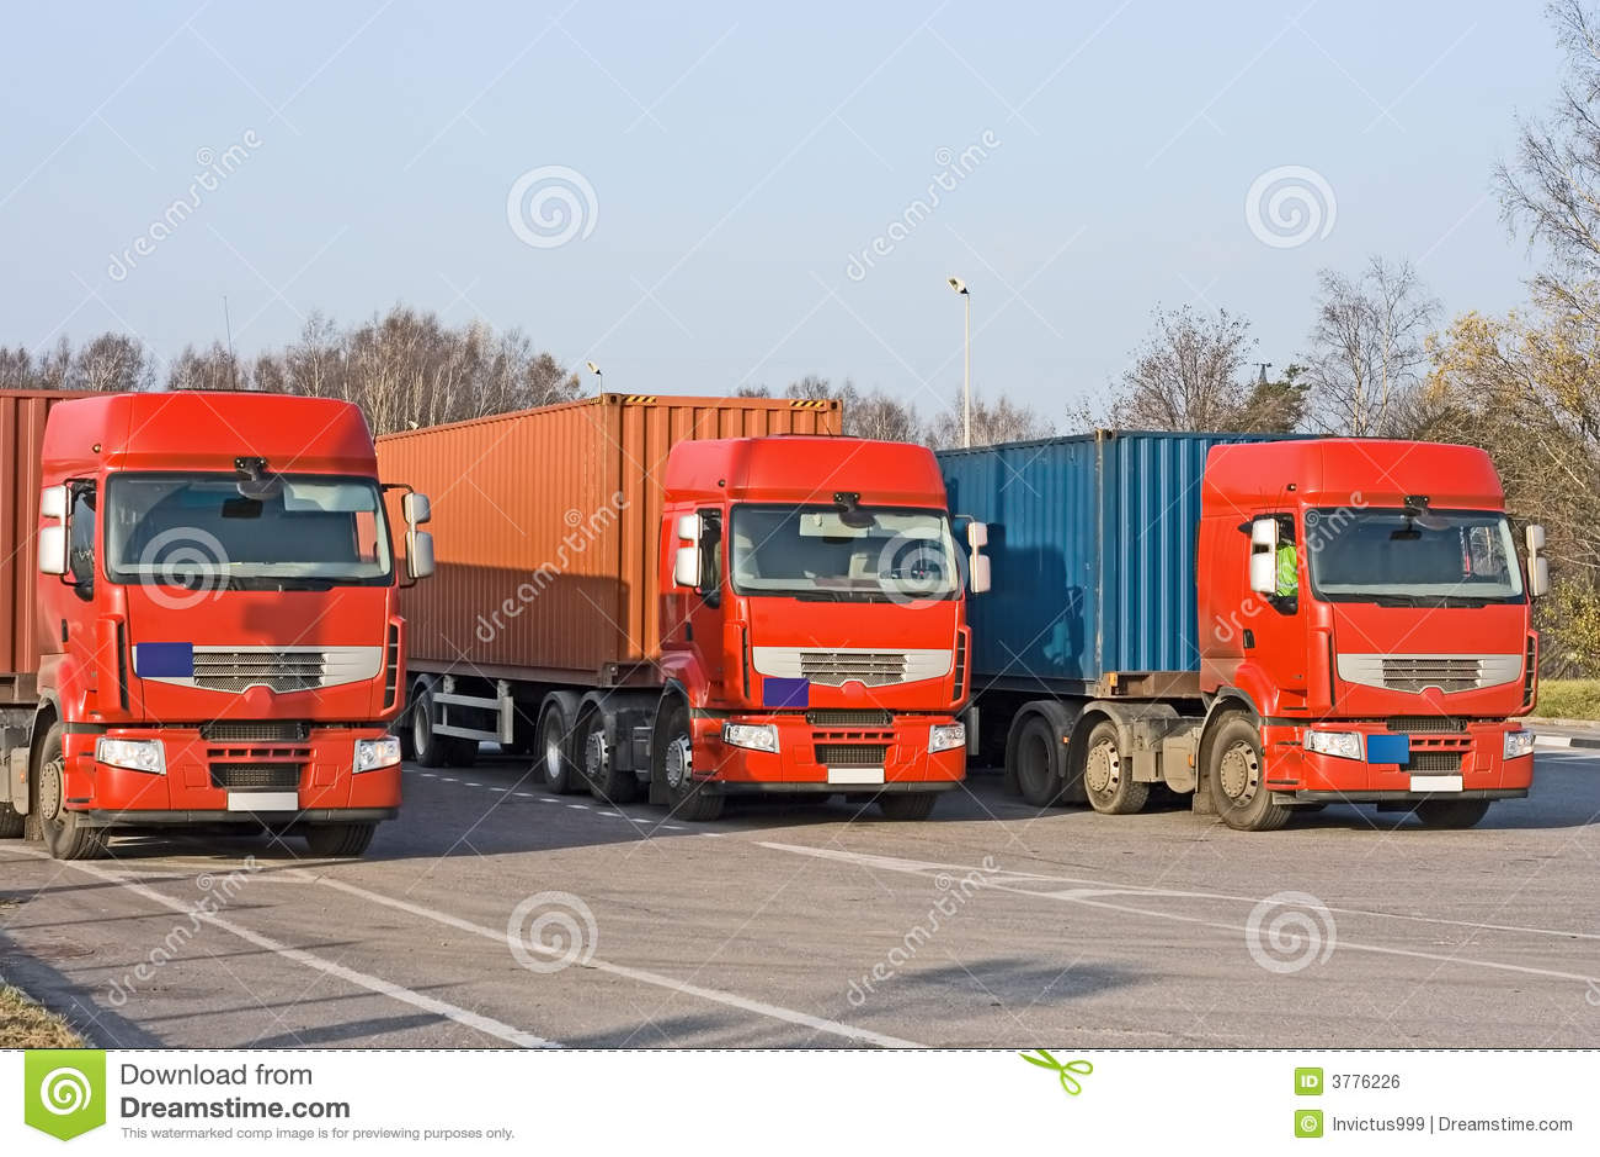 Entrancing Myport Reference Of Pattern 3 Semi Trucks At E Loading